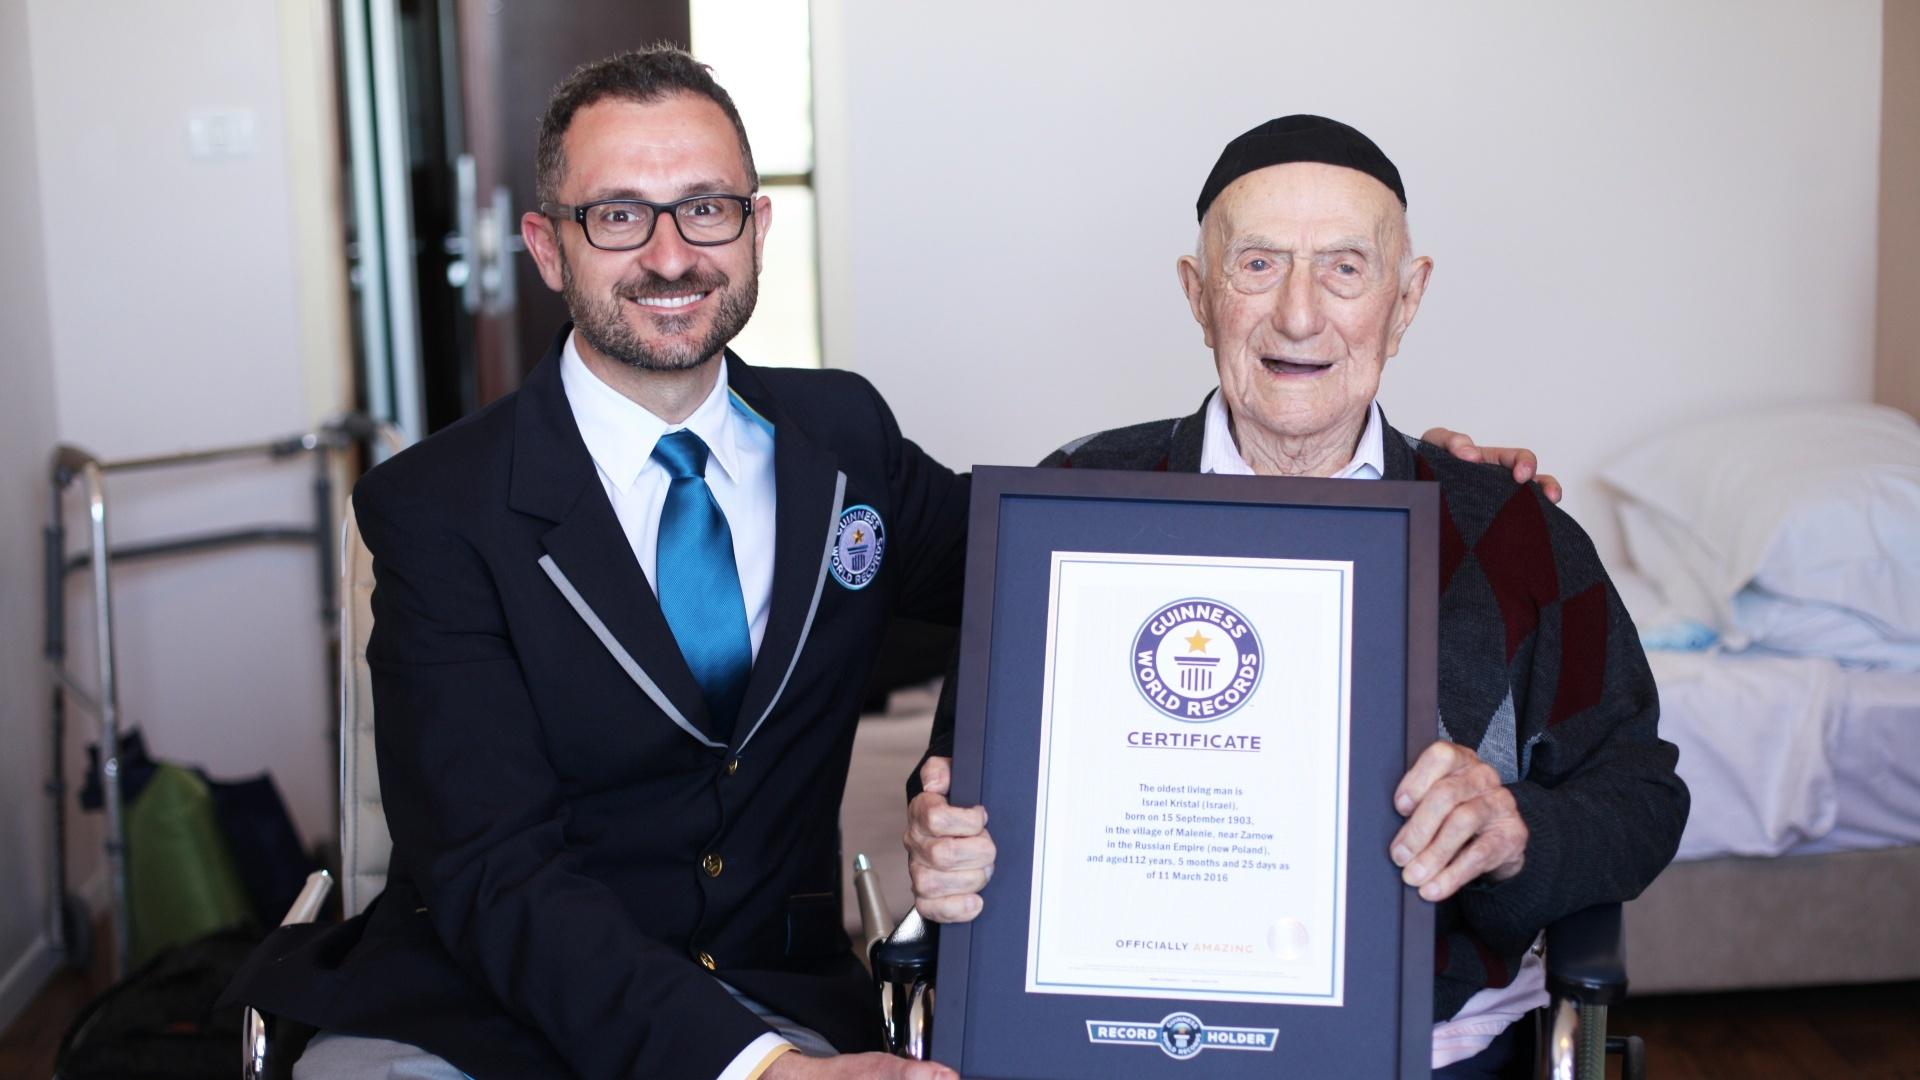 The world's oldest man